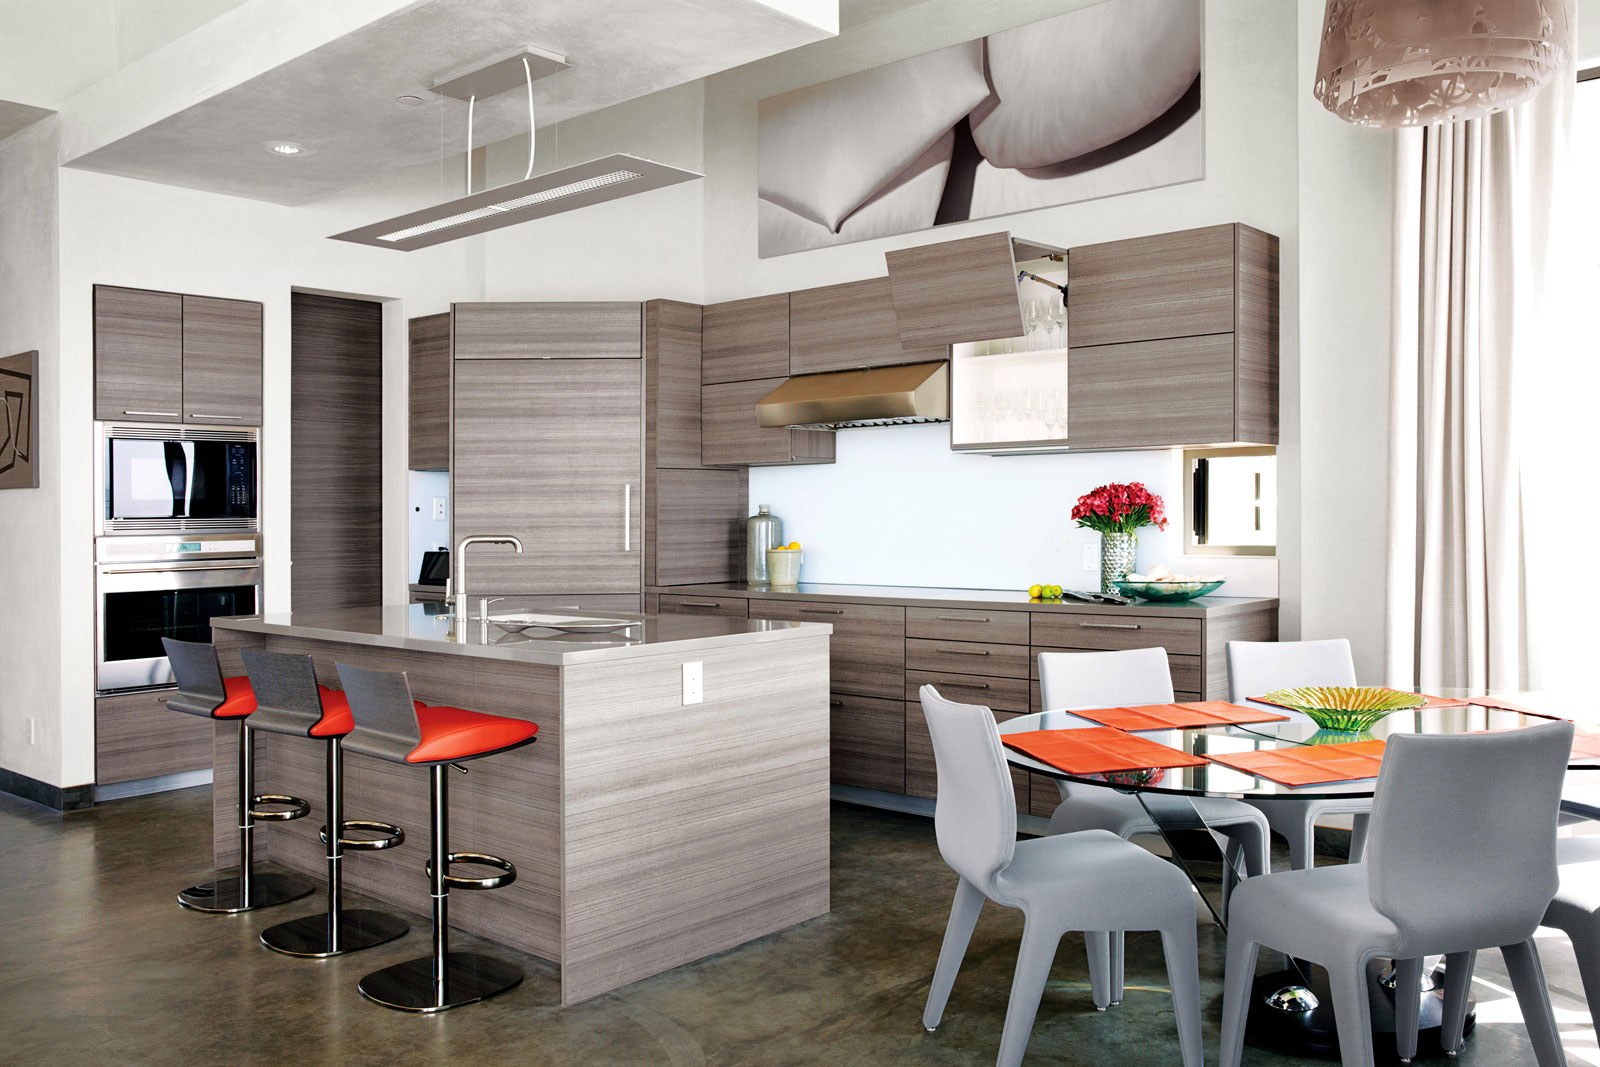 køkken-ø-breakfast-bar-spisebord-miljøvenlige-strand-hus-i-california